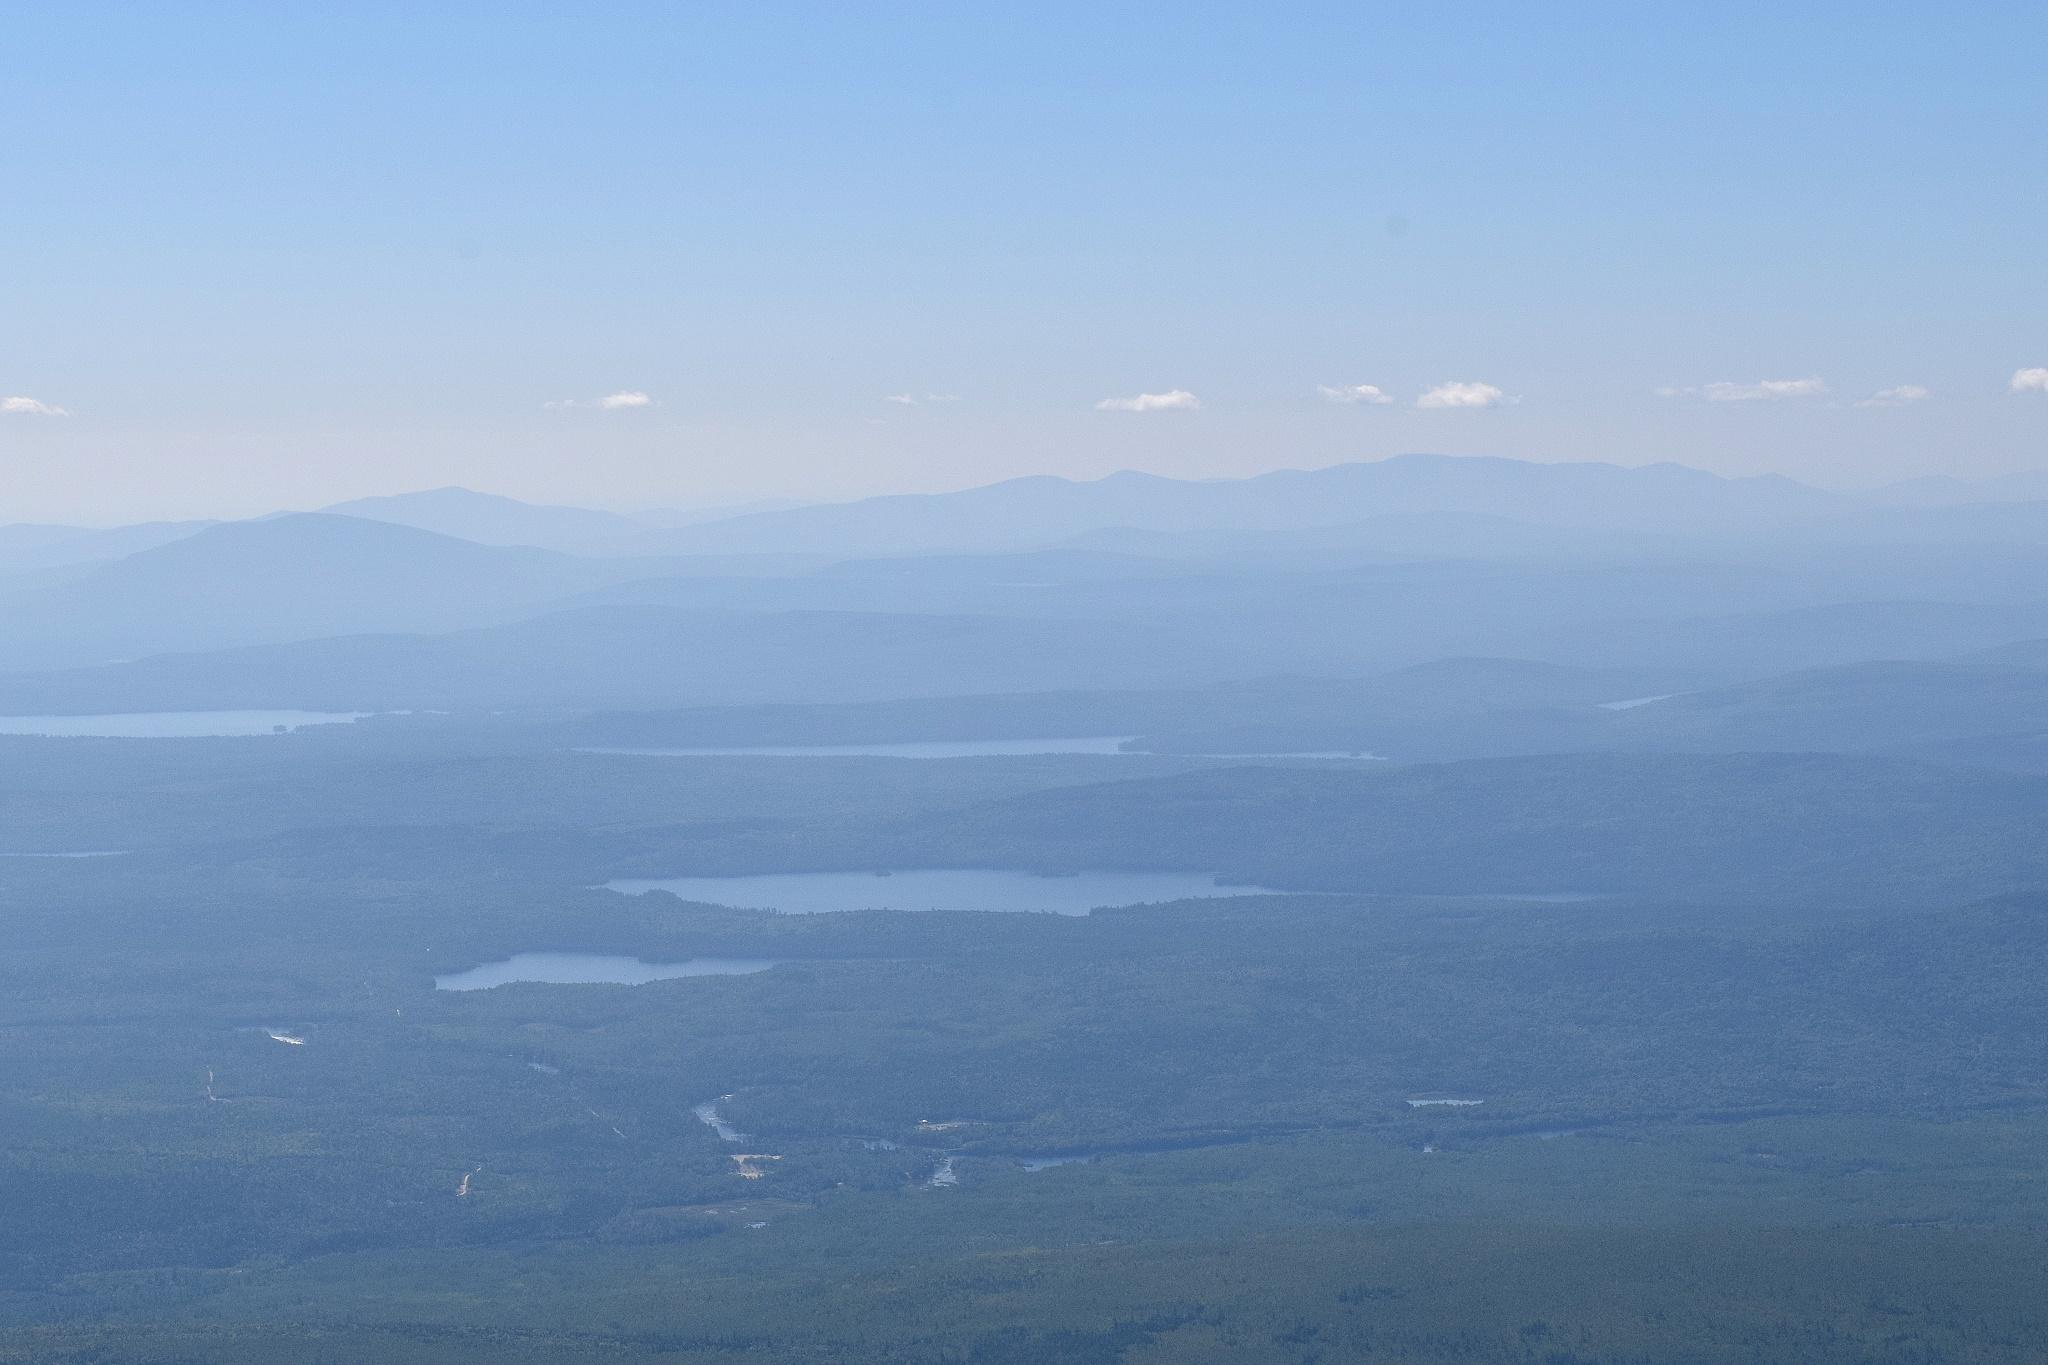 Appalachians-in-Maine